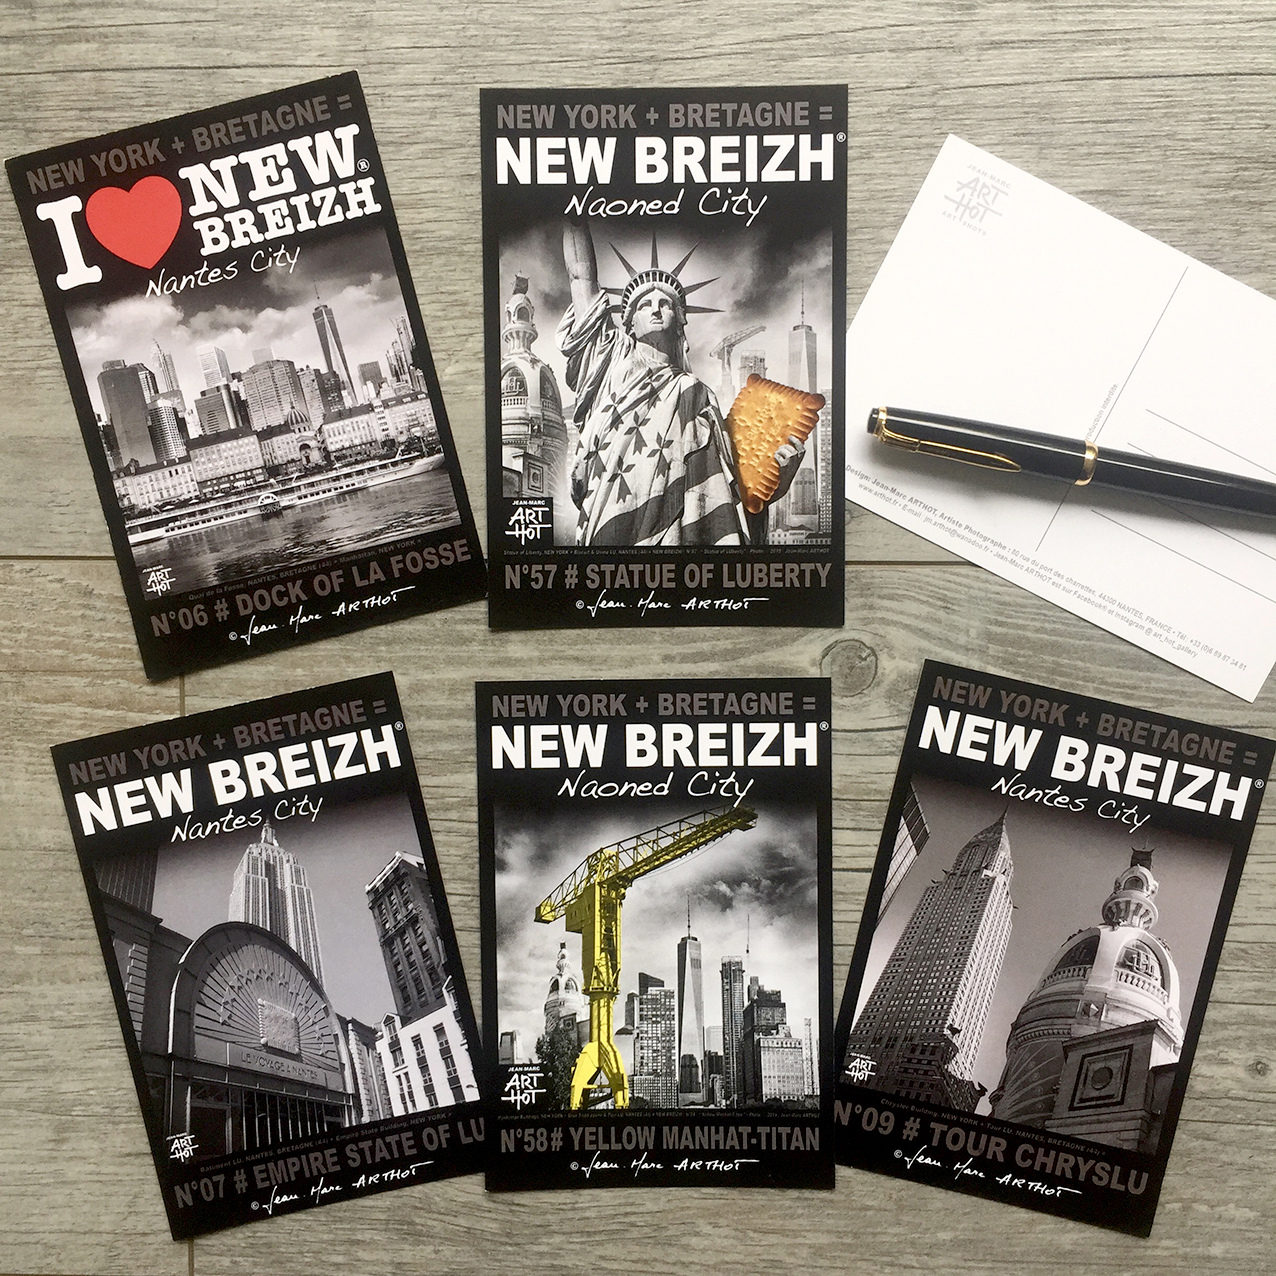 LOT B - 5 CARTES POSTALES NEW BREIZH - Naoned City 01